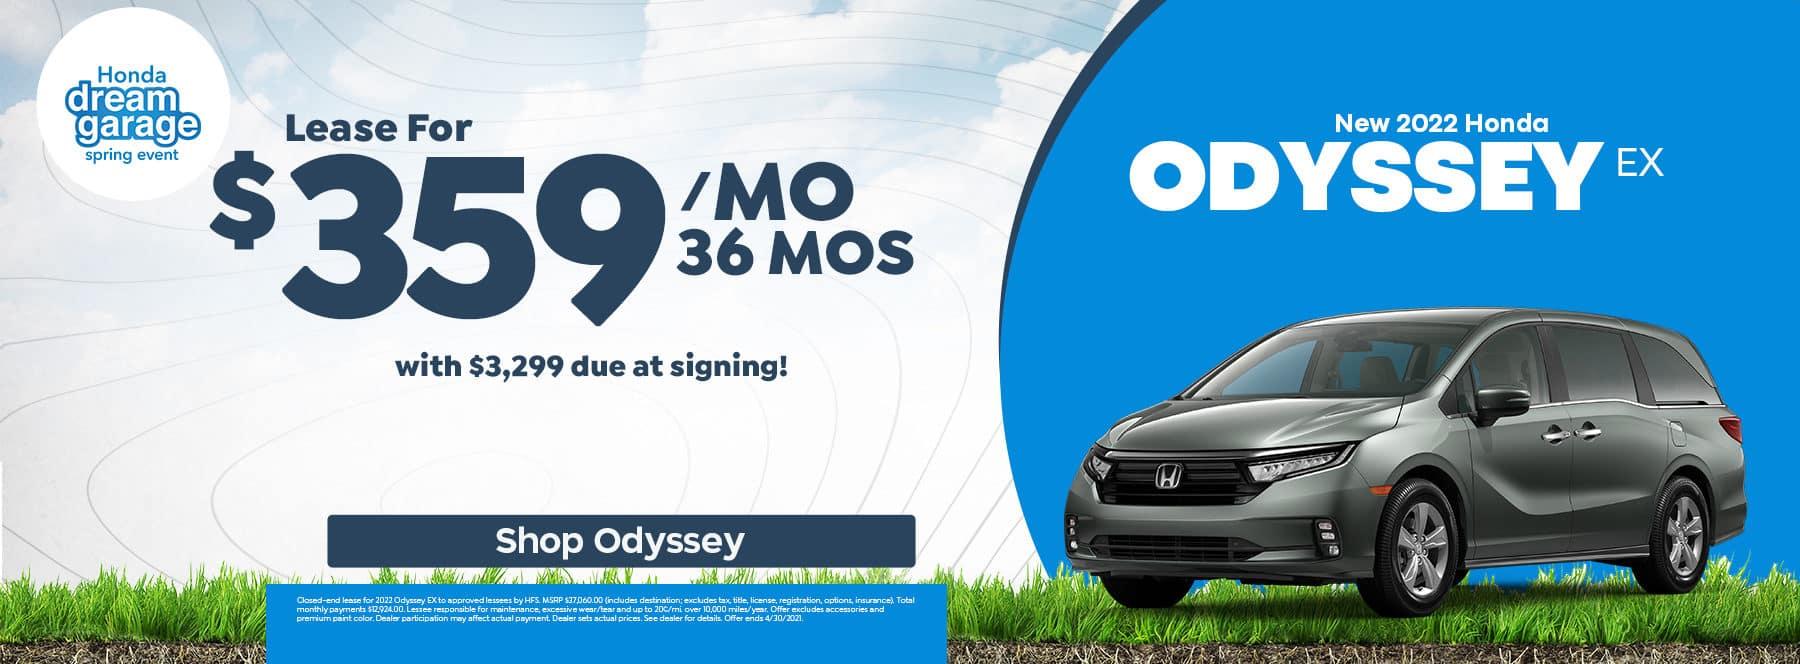 Lease 2022 Honda Odyssey - Roswell, GA